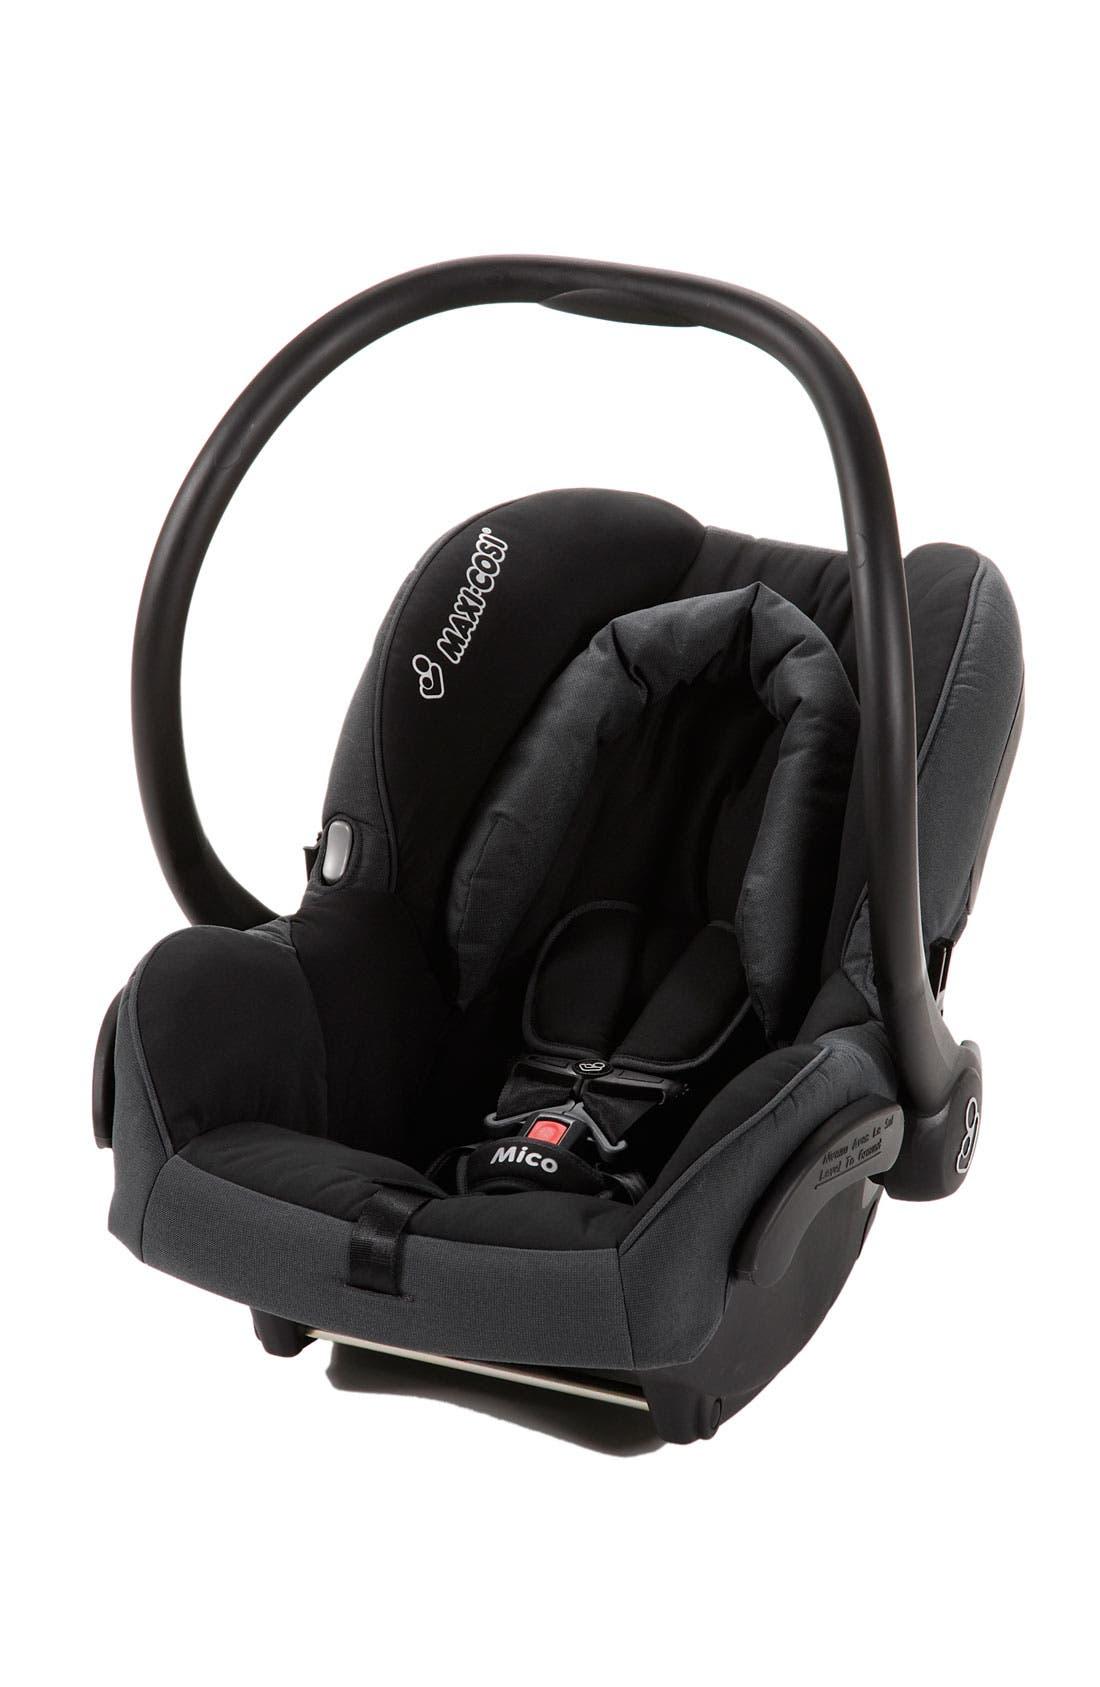 Alternate Image 2  - Maxi-Cosi® 'Mico' Infant Car Seat